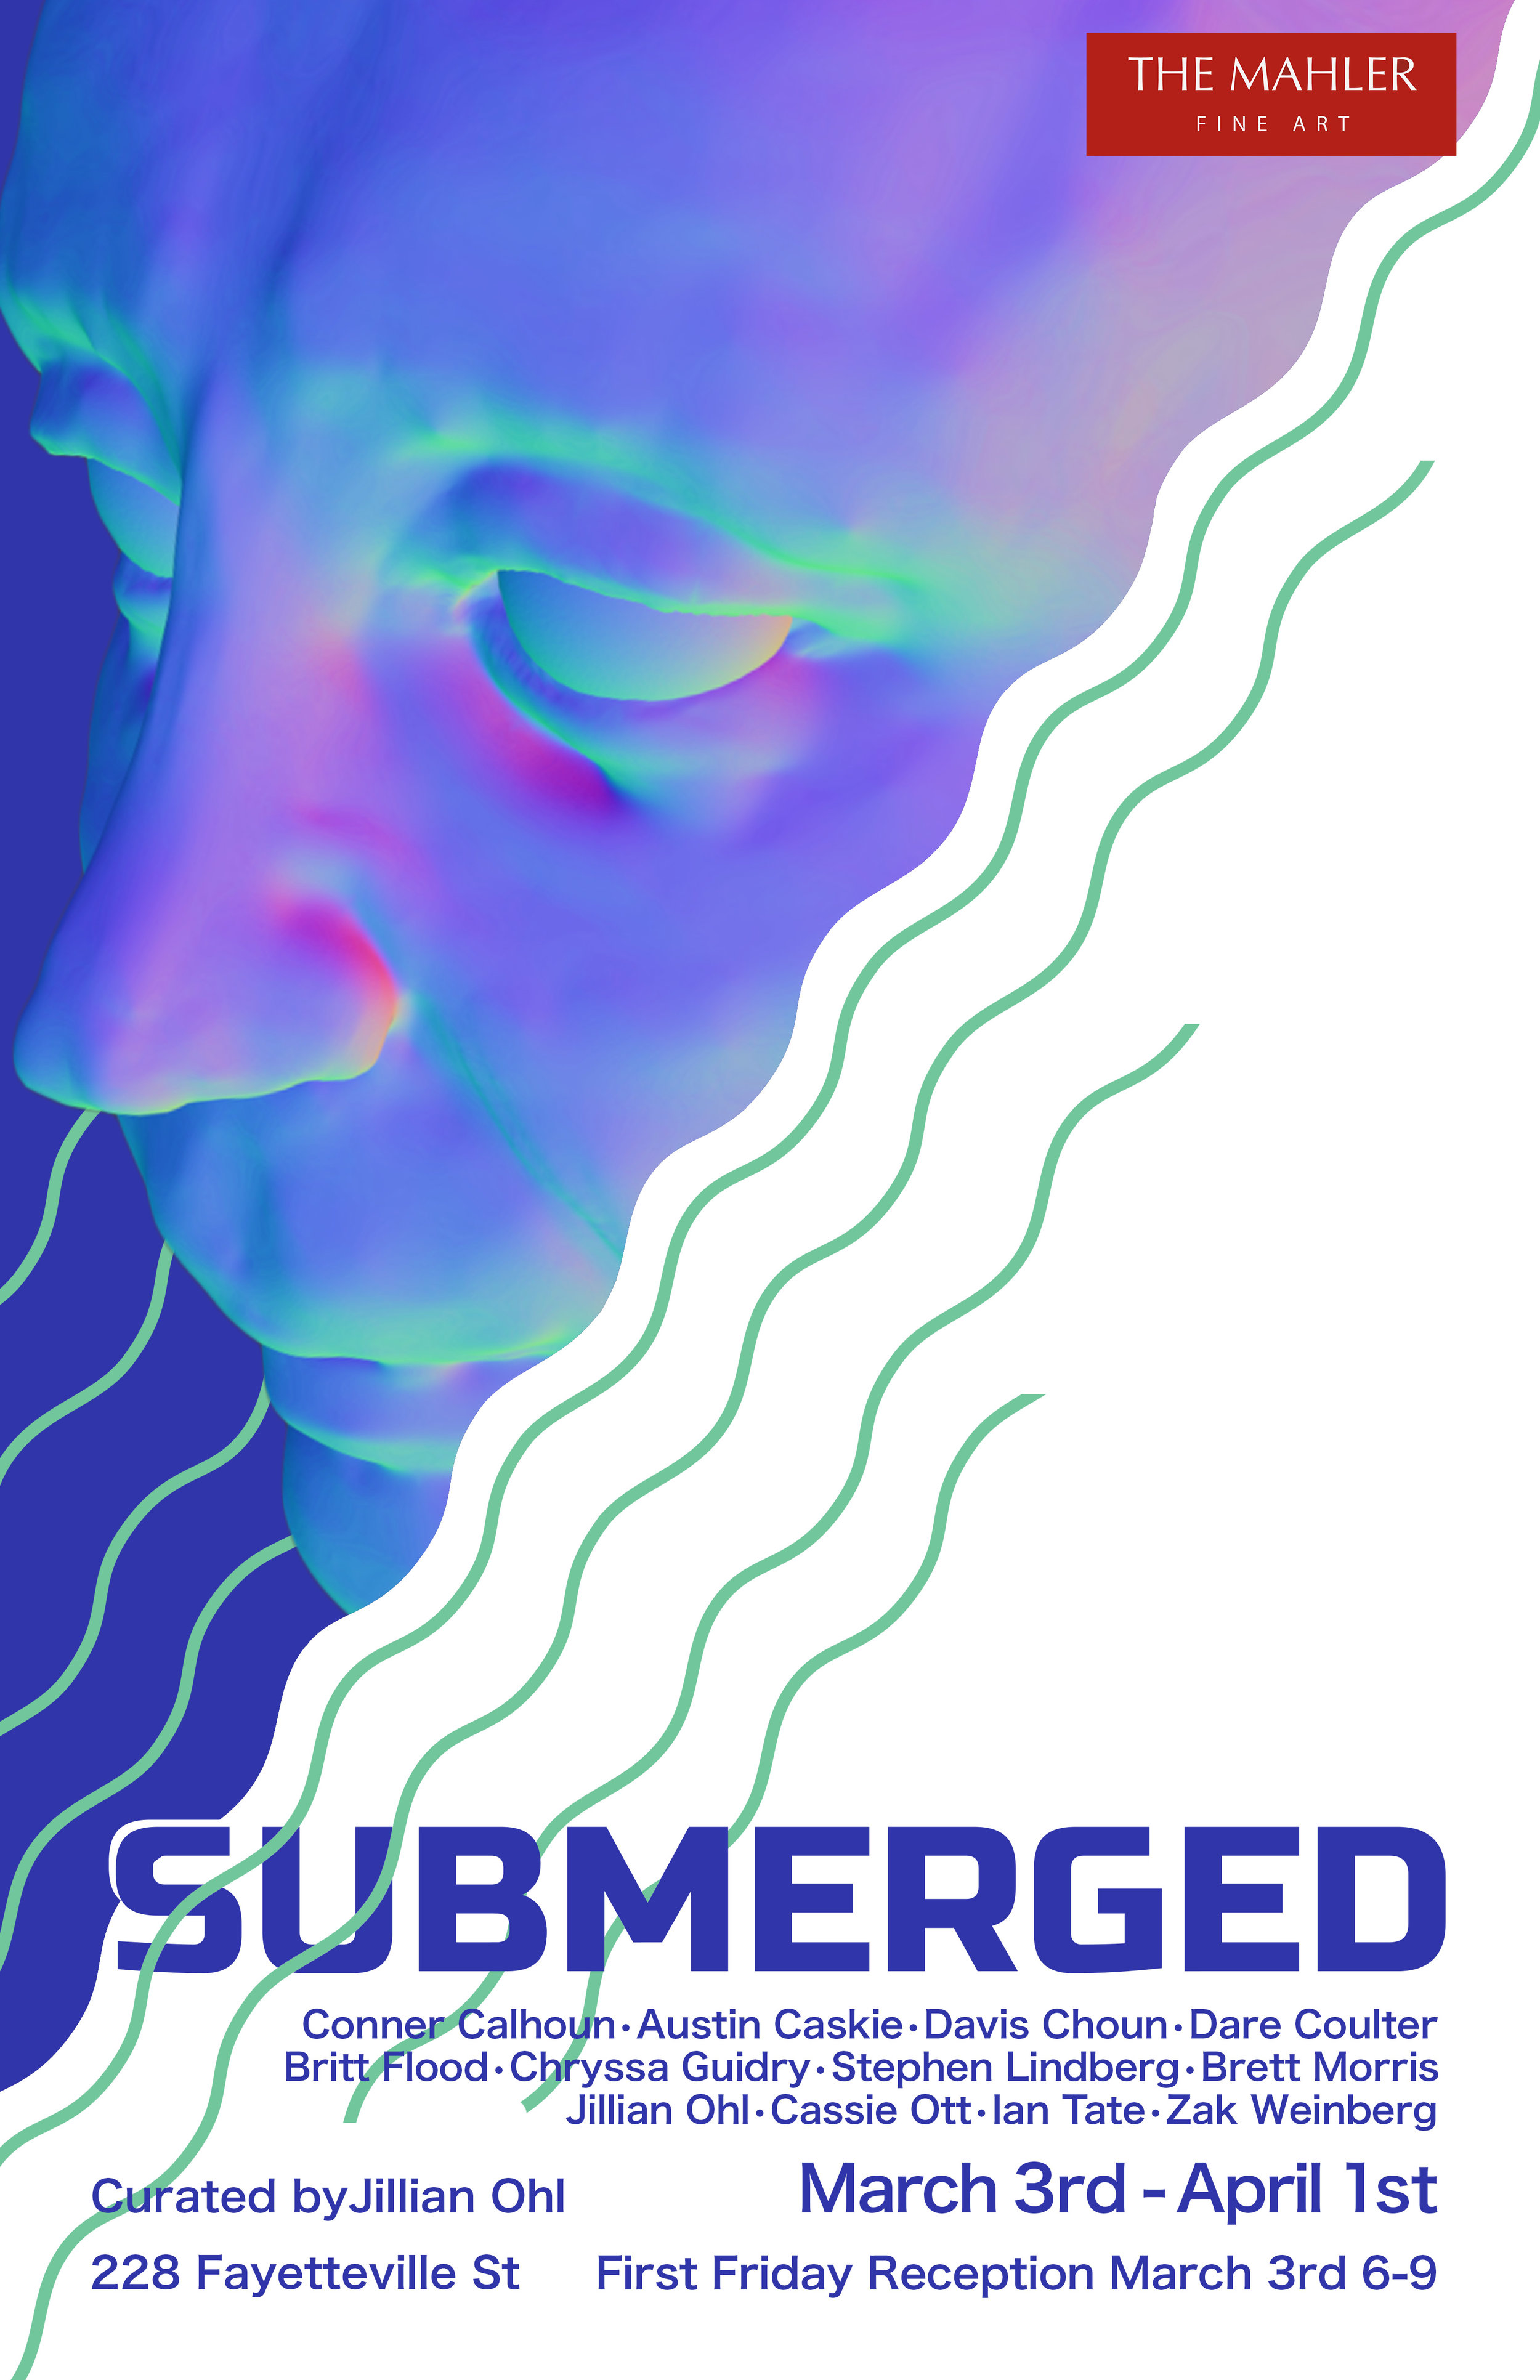 SubmergedArtistsPoster (setphen remix).jpg